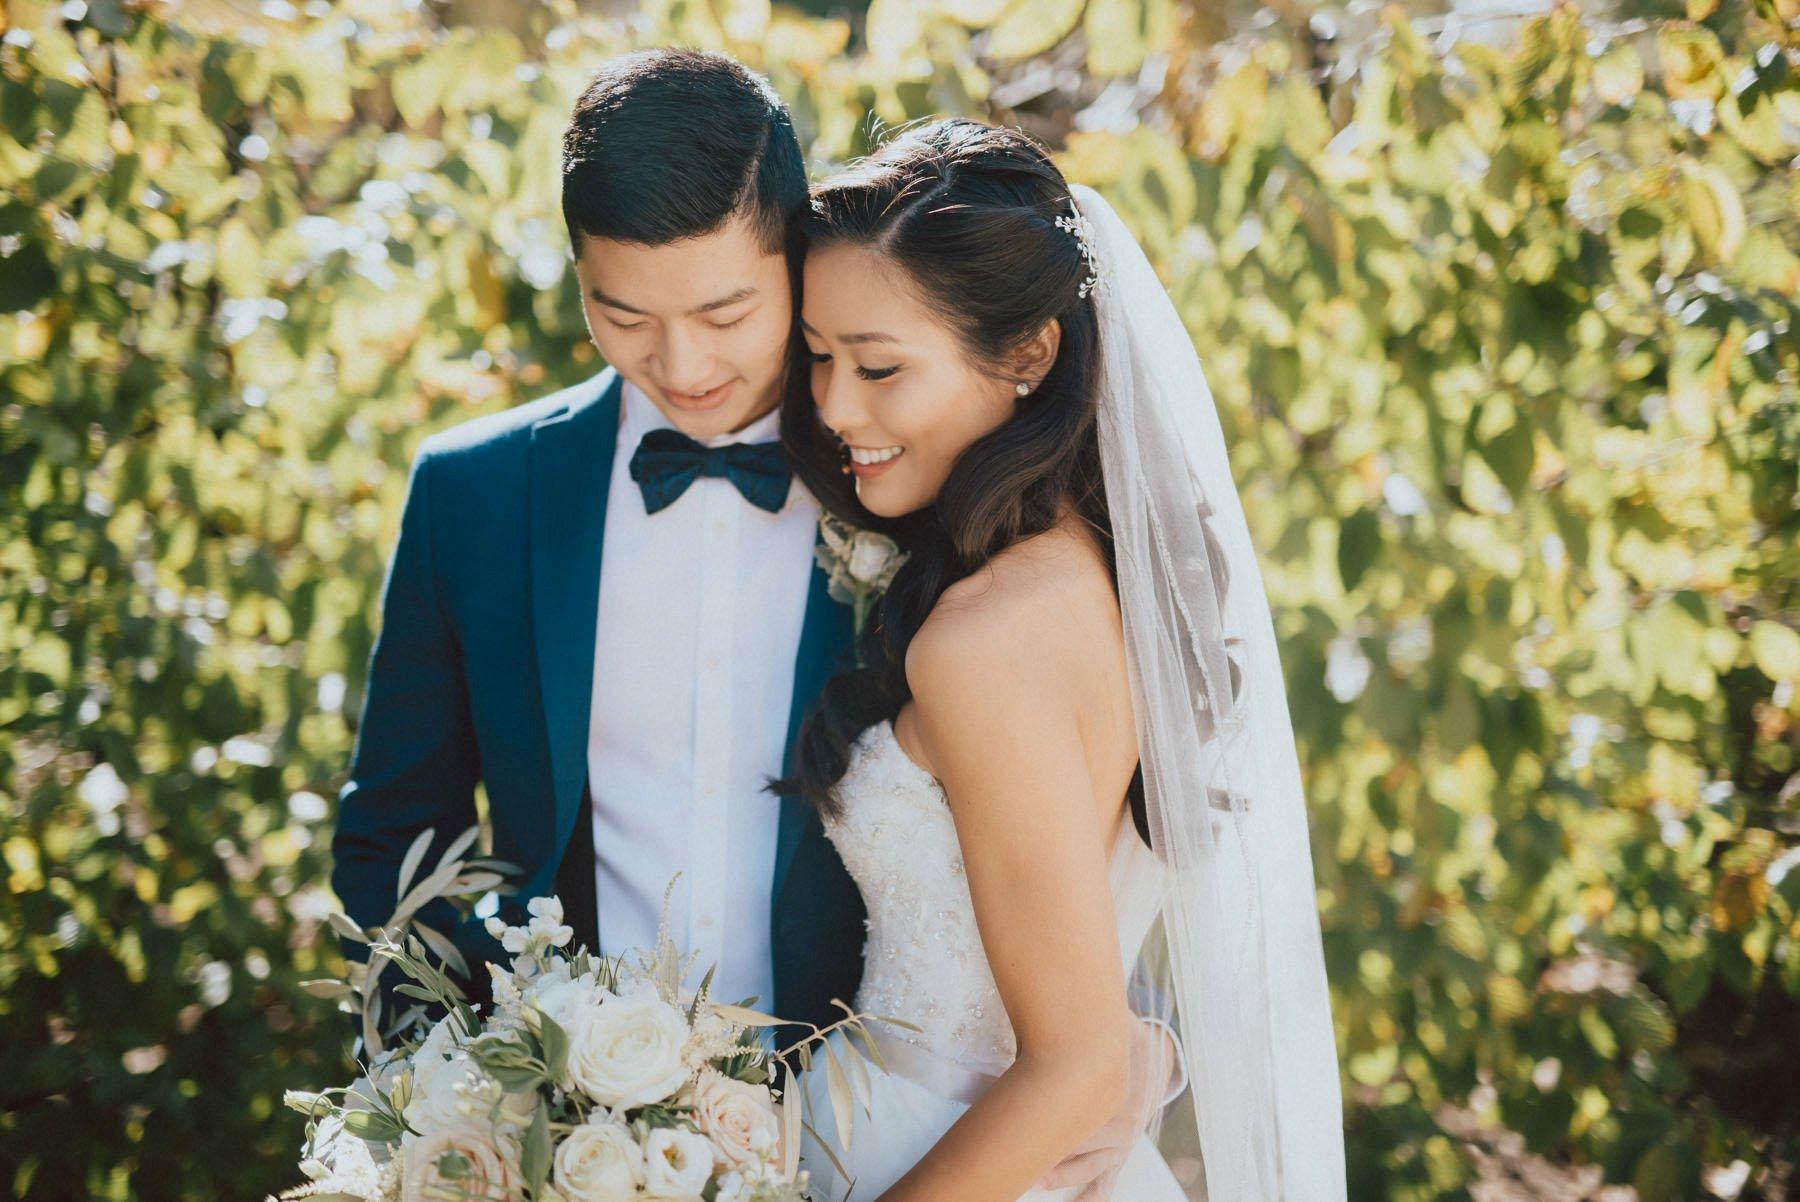 philadelphia-wedding-photographer-58.jpg